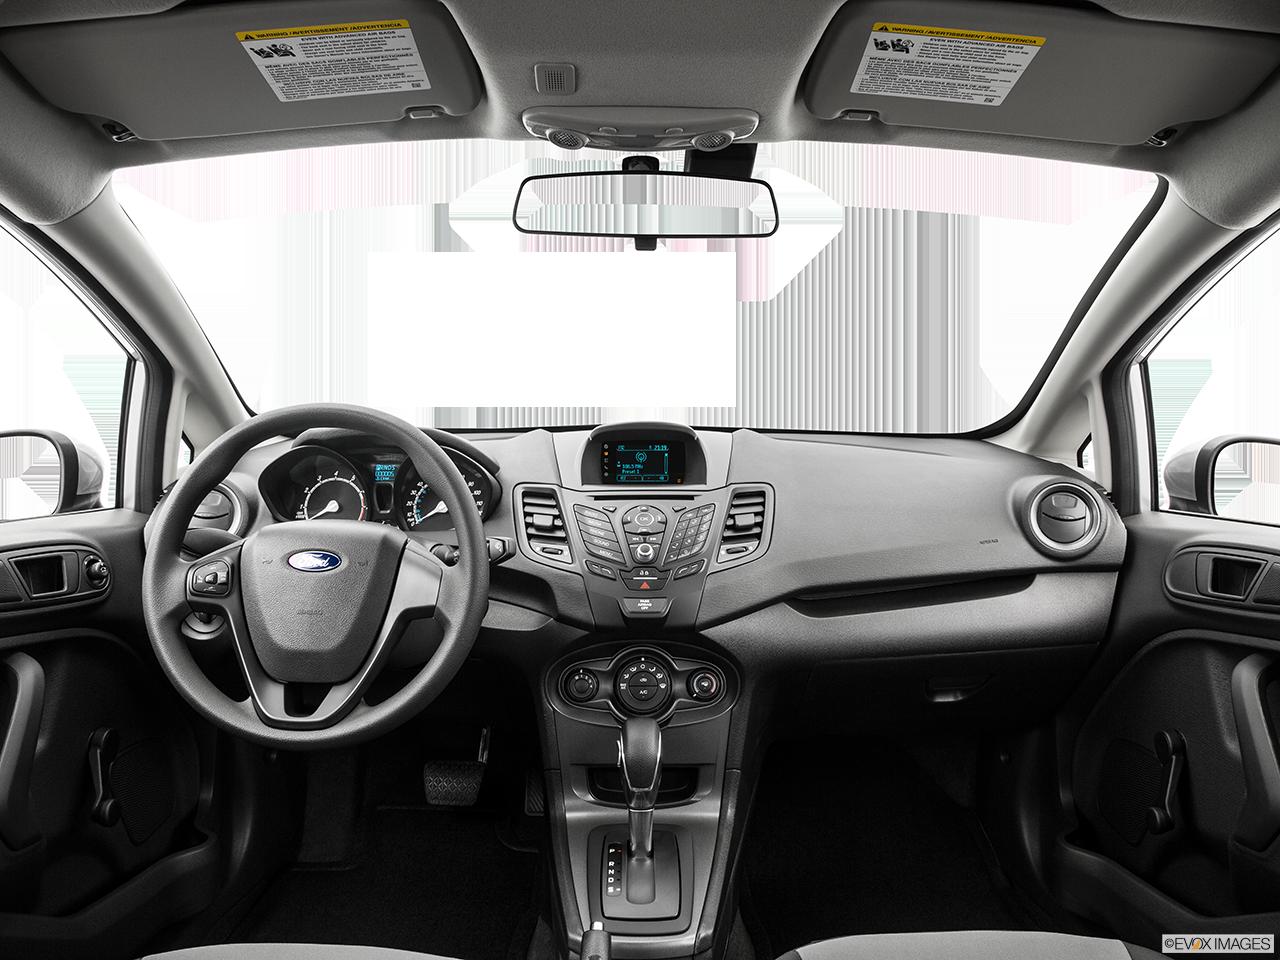 2016 Ford Fiesta Dealer In Harrisburg Hoffman Ford